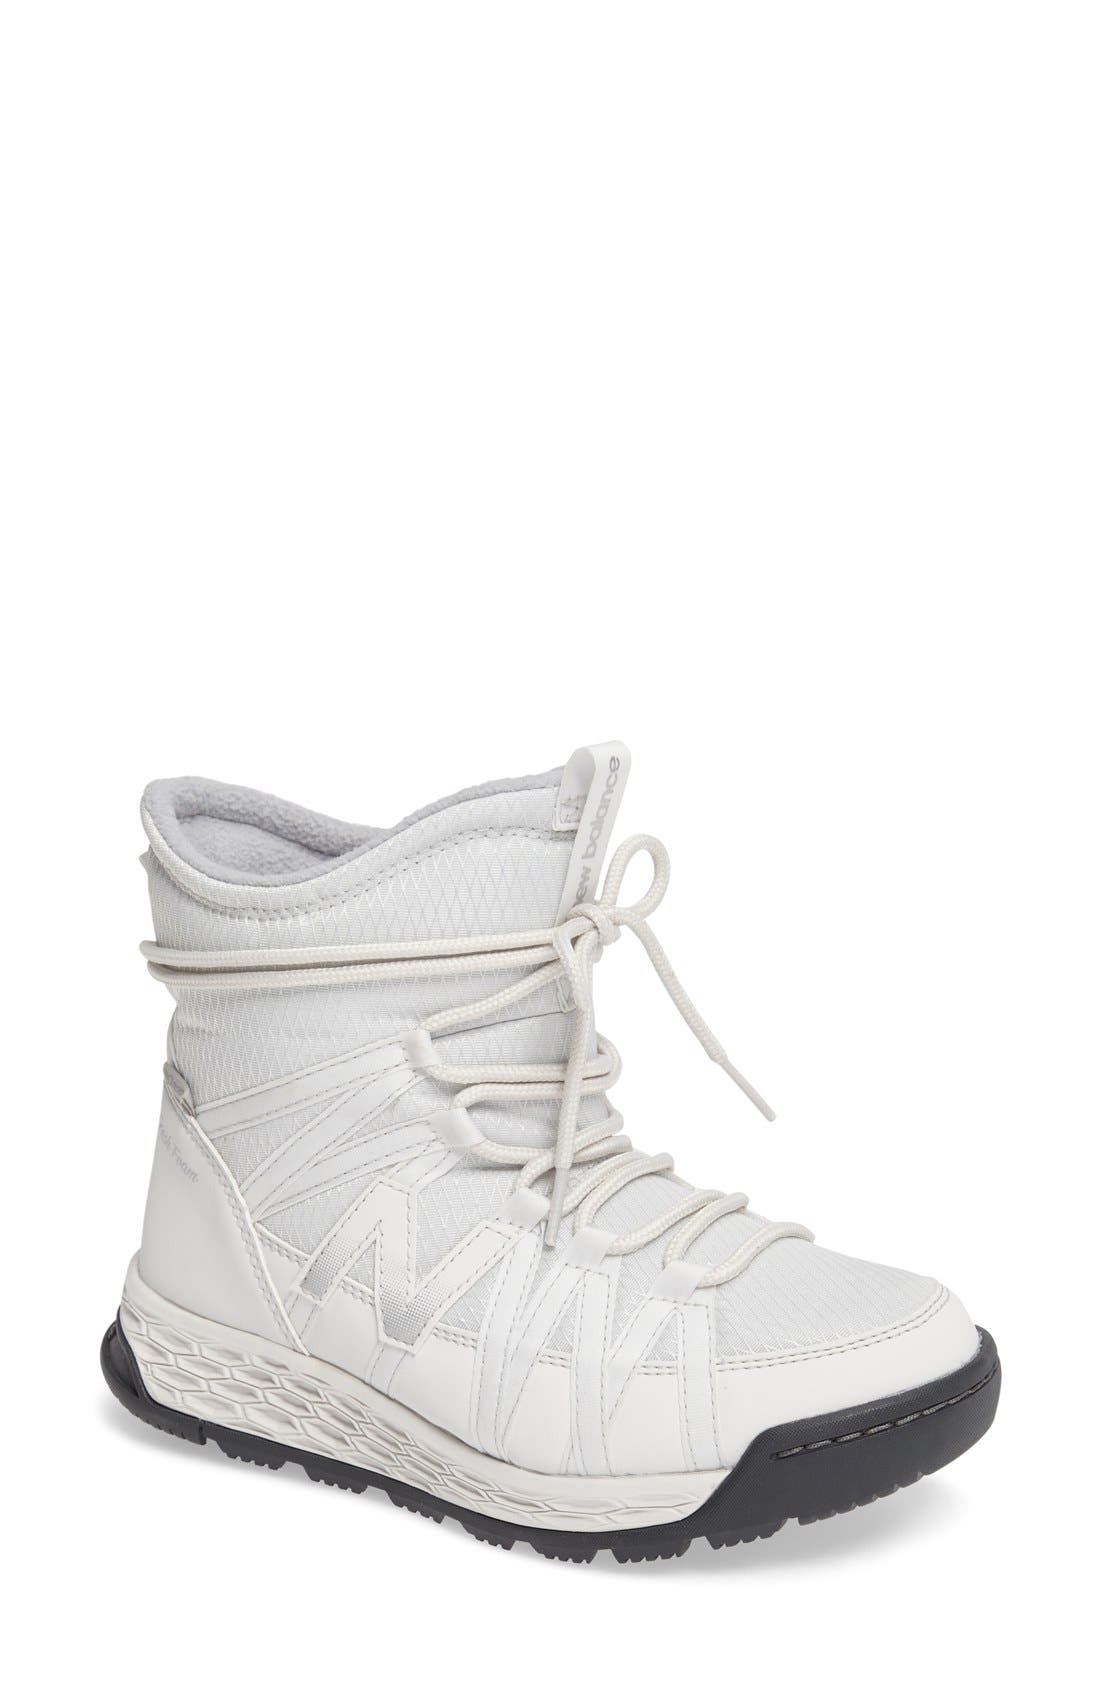 Q416 Weatherproof Snow Boot,                             Main thumbnail 3, color,